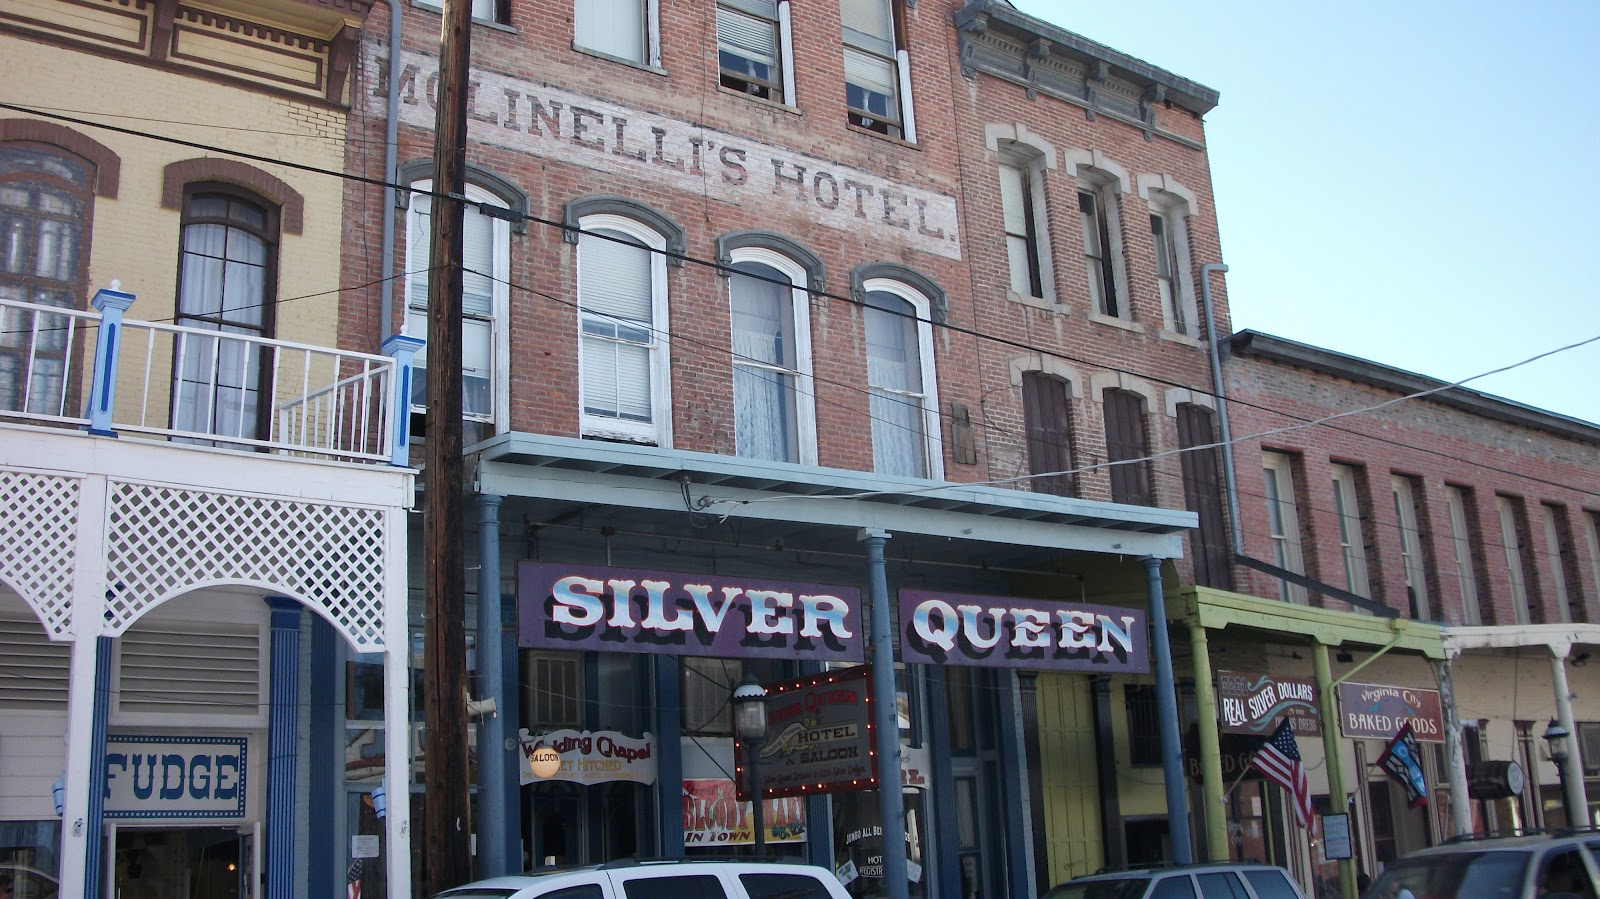 Evp Silver Queen Hotel Virginia City Nv 7 12 Voice To 25